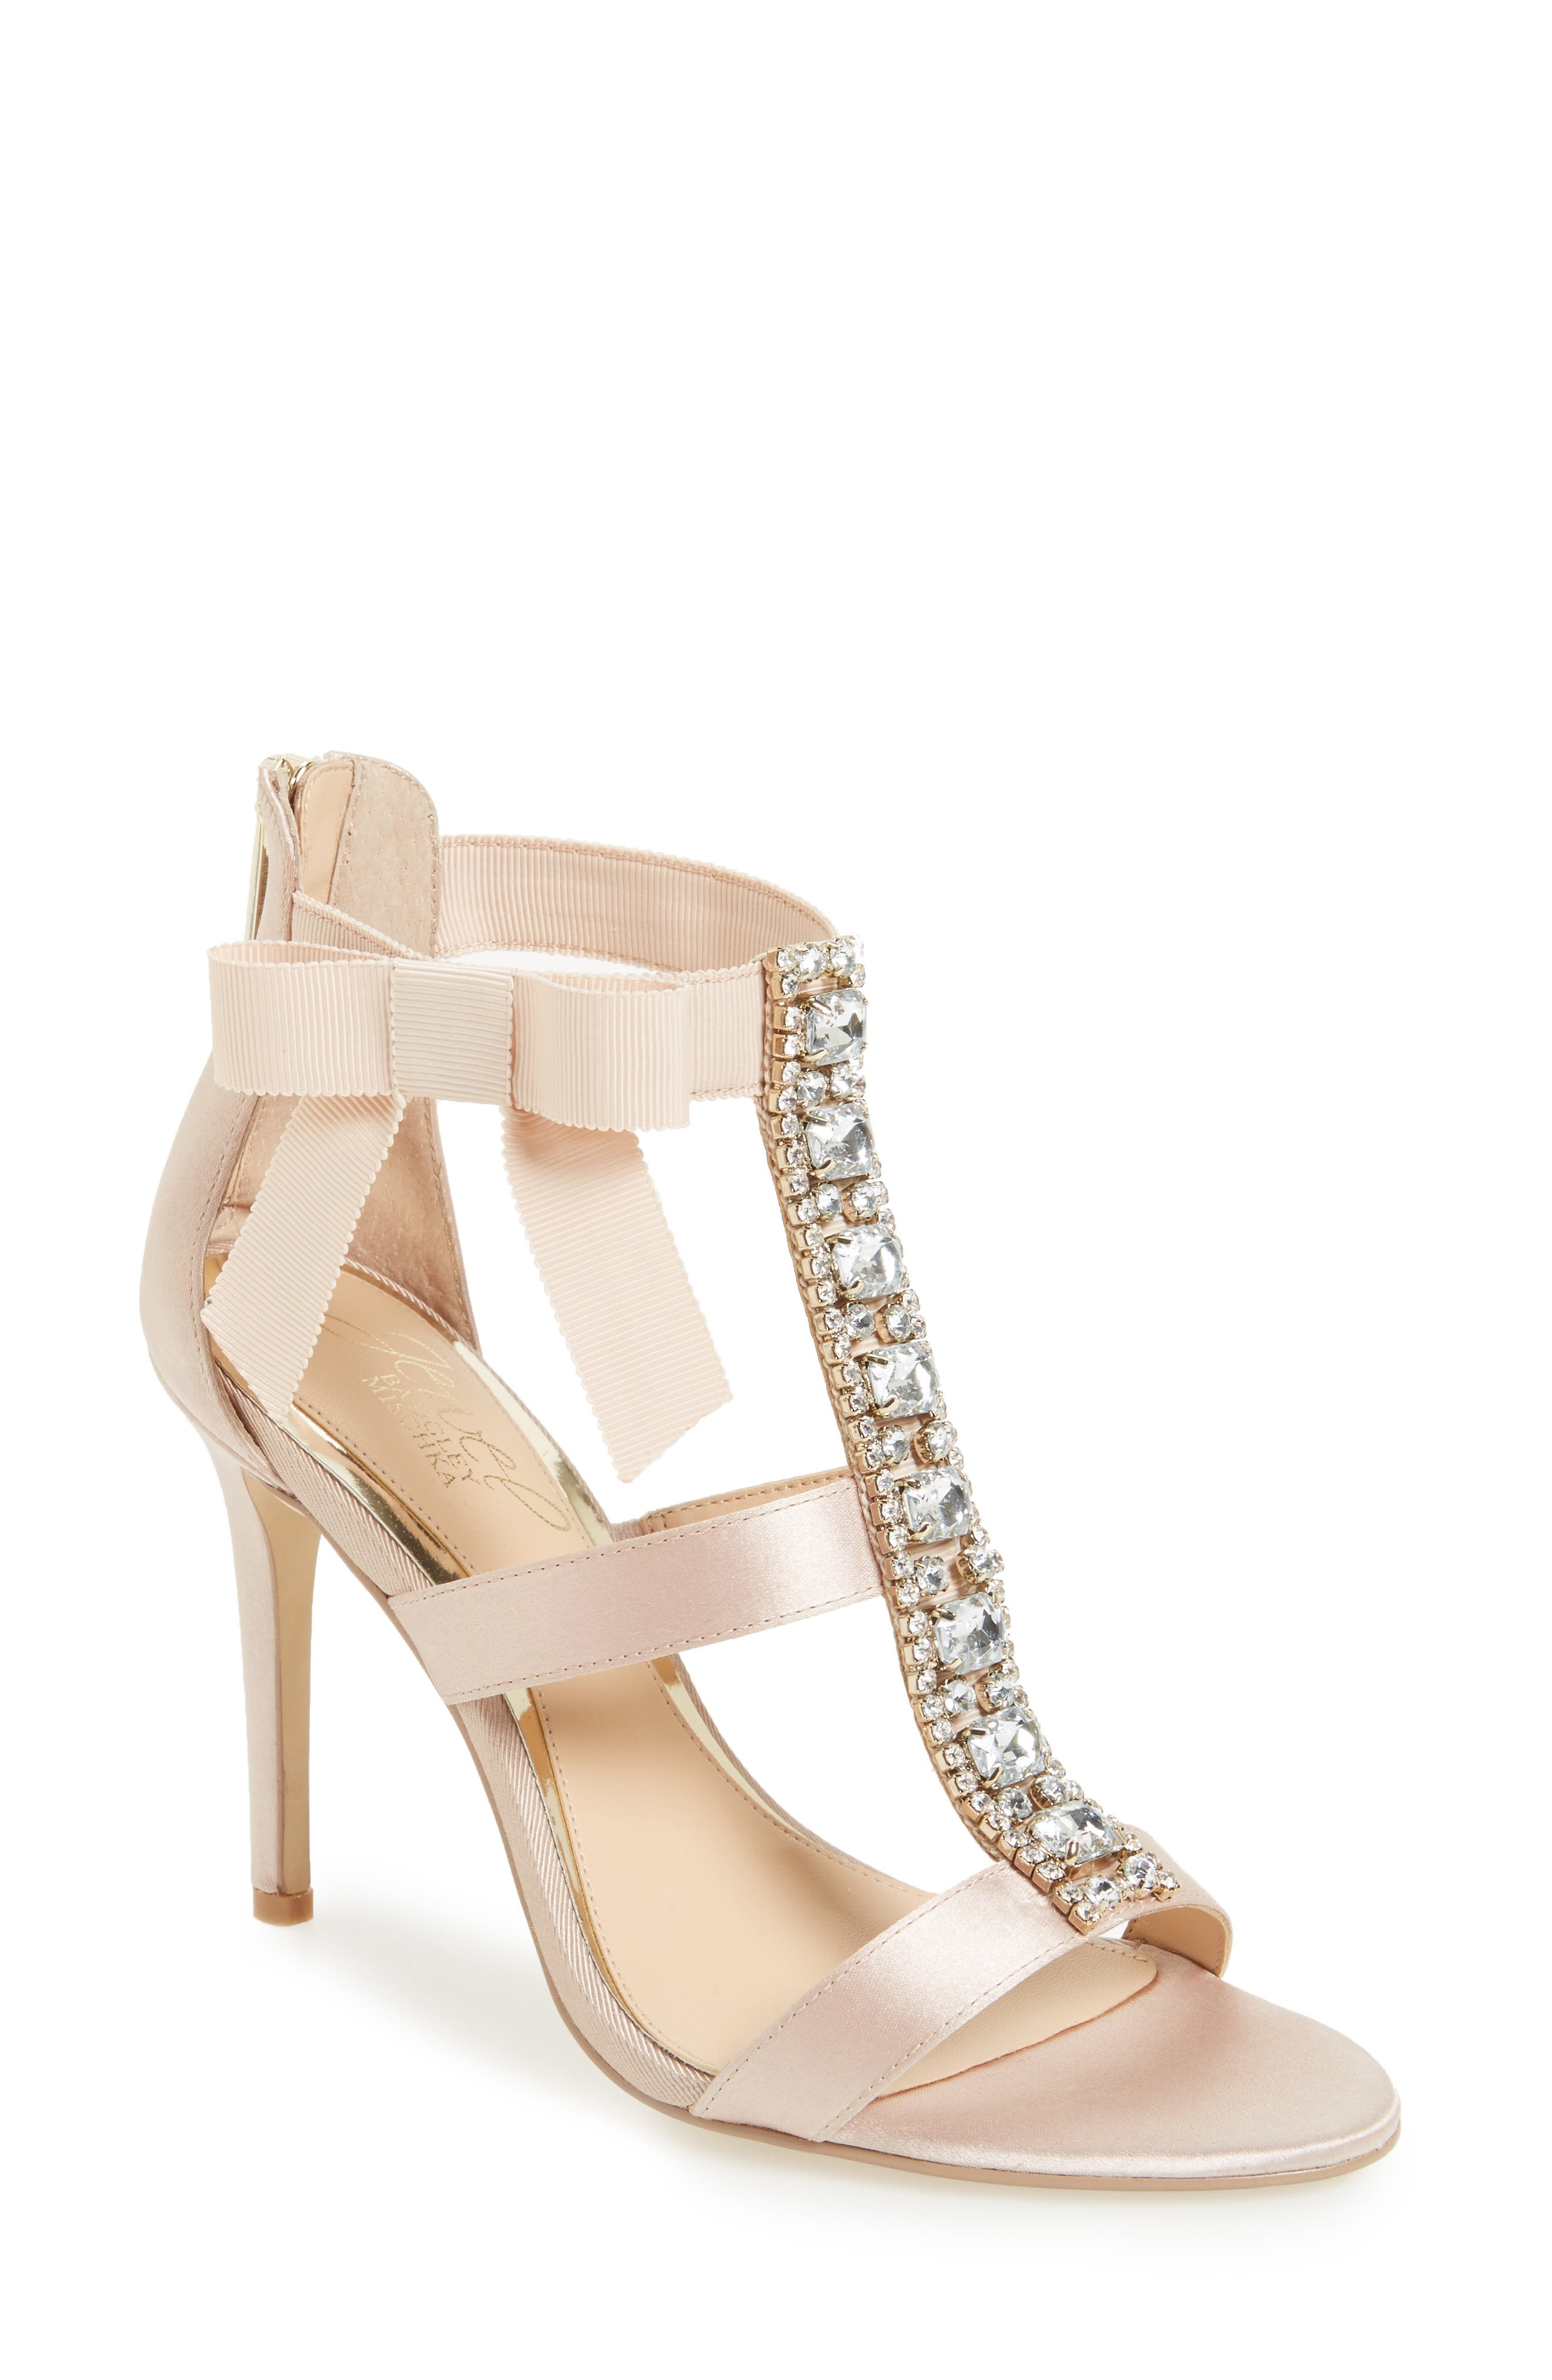 Jewel Badgley Mischka Henderson Embellished Bow Sandal